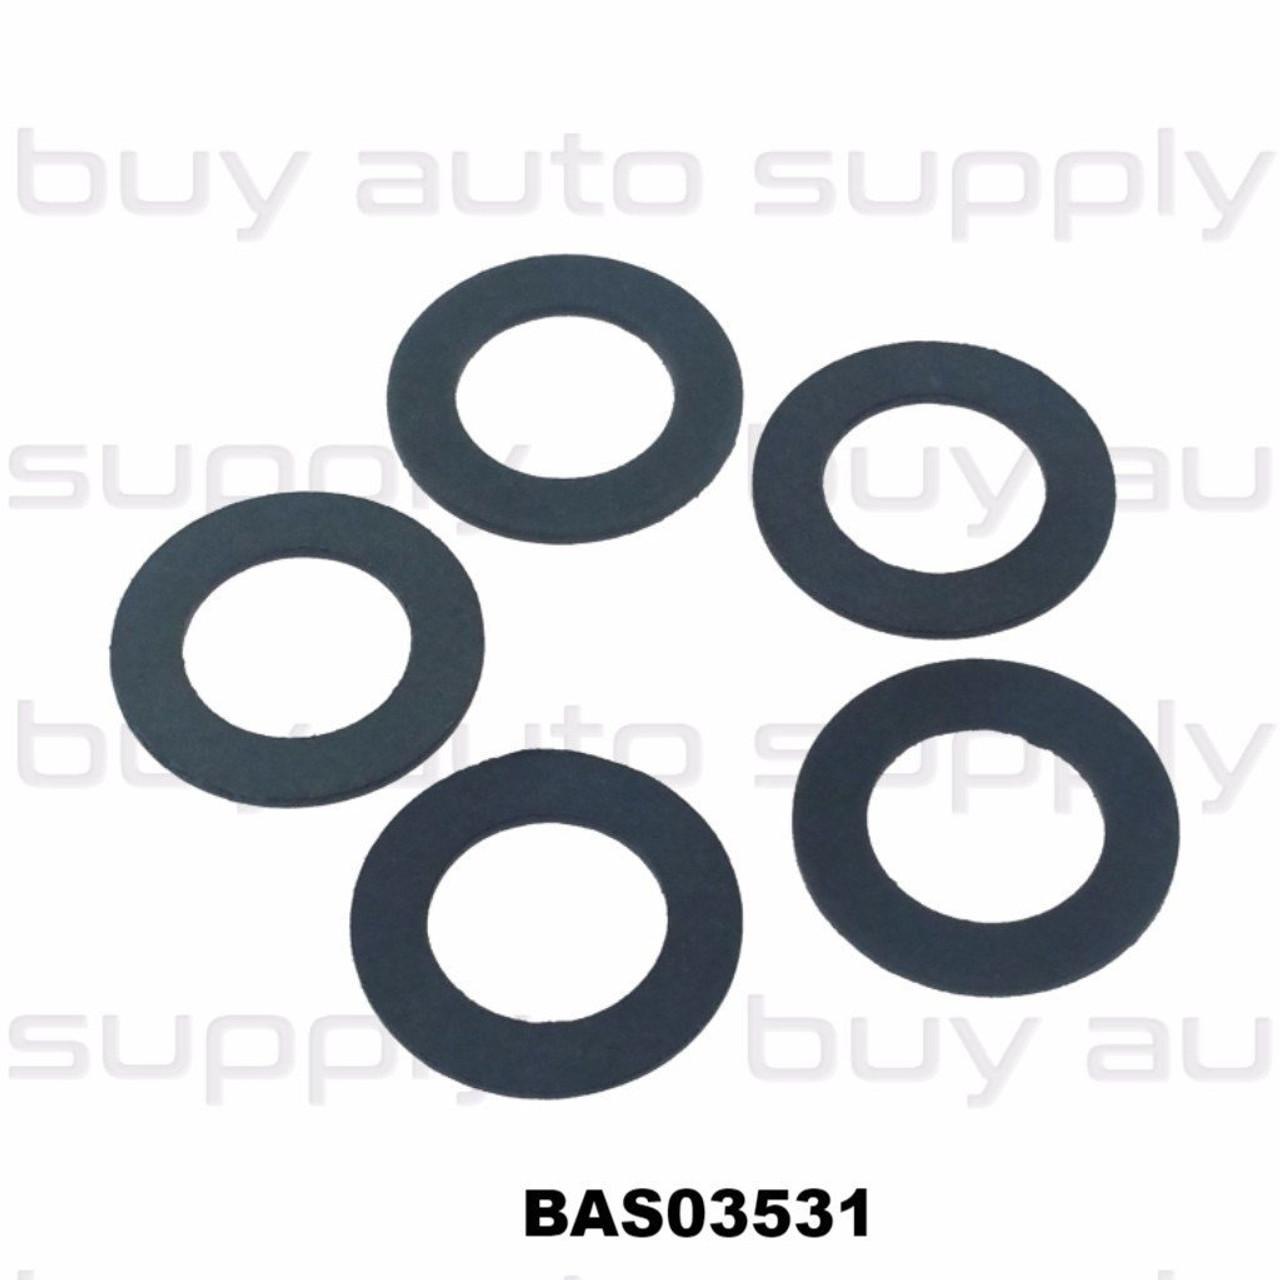 Fiber Drain Plug Gasket M12 - BAS03531 Interchanges: 097016, 97016, 7041077